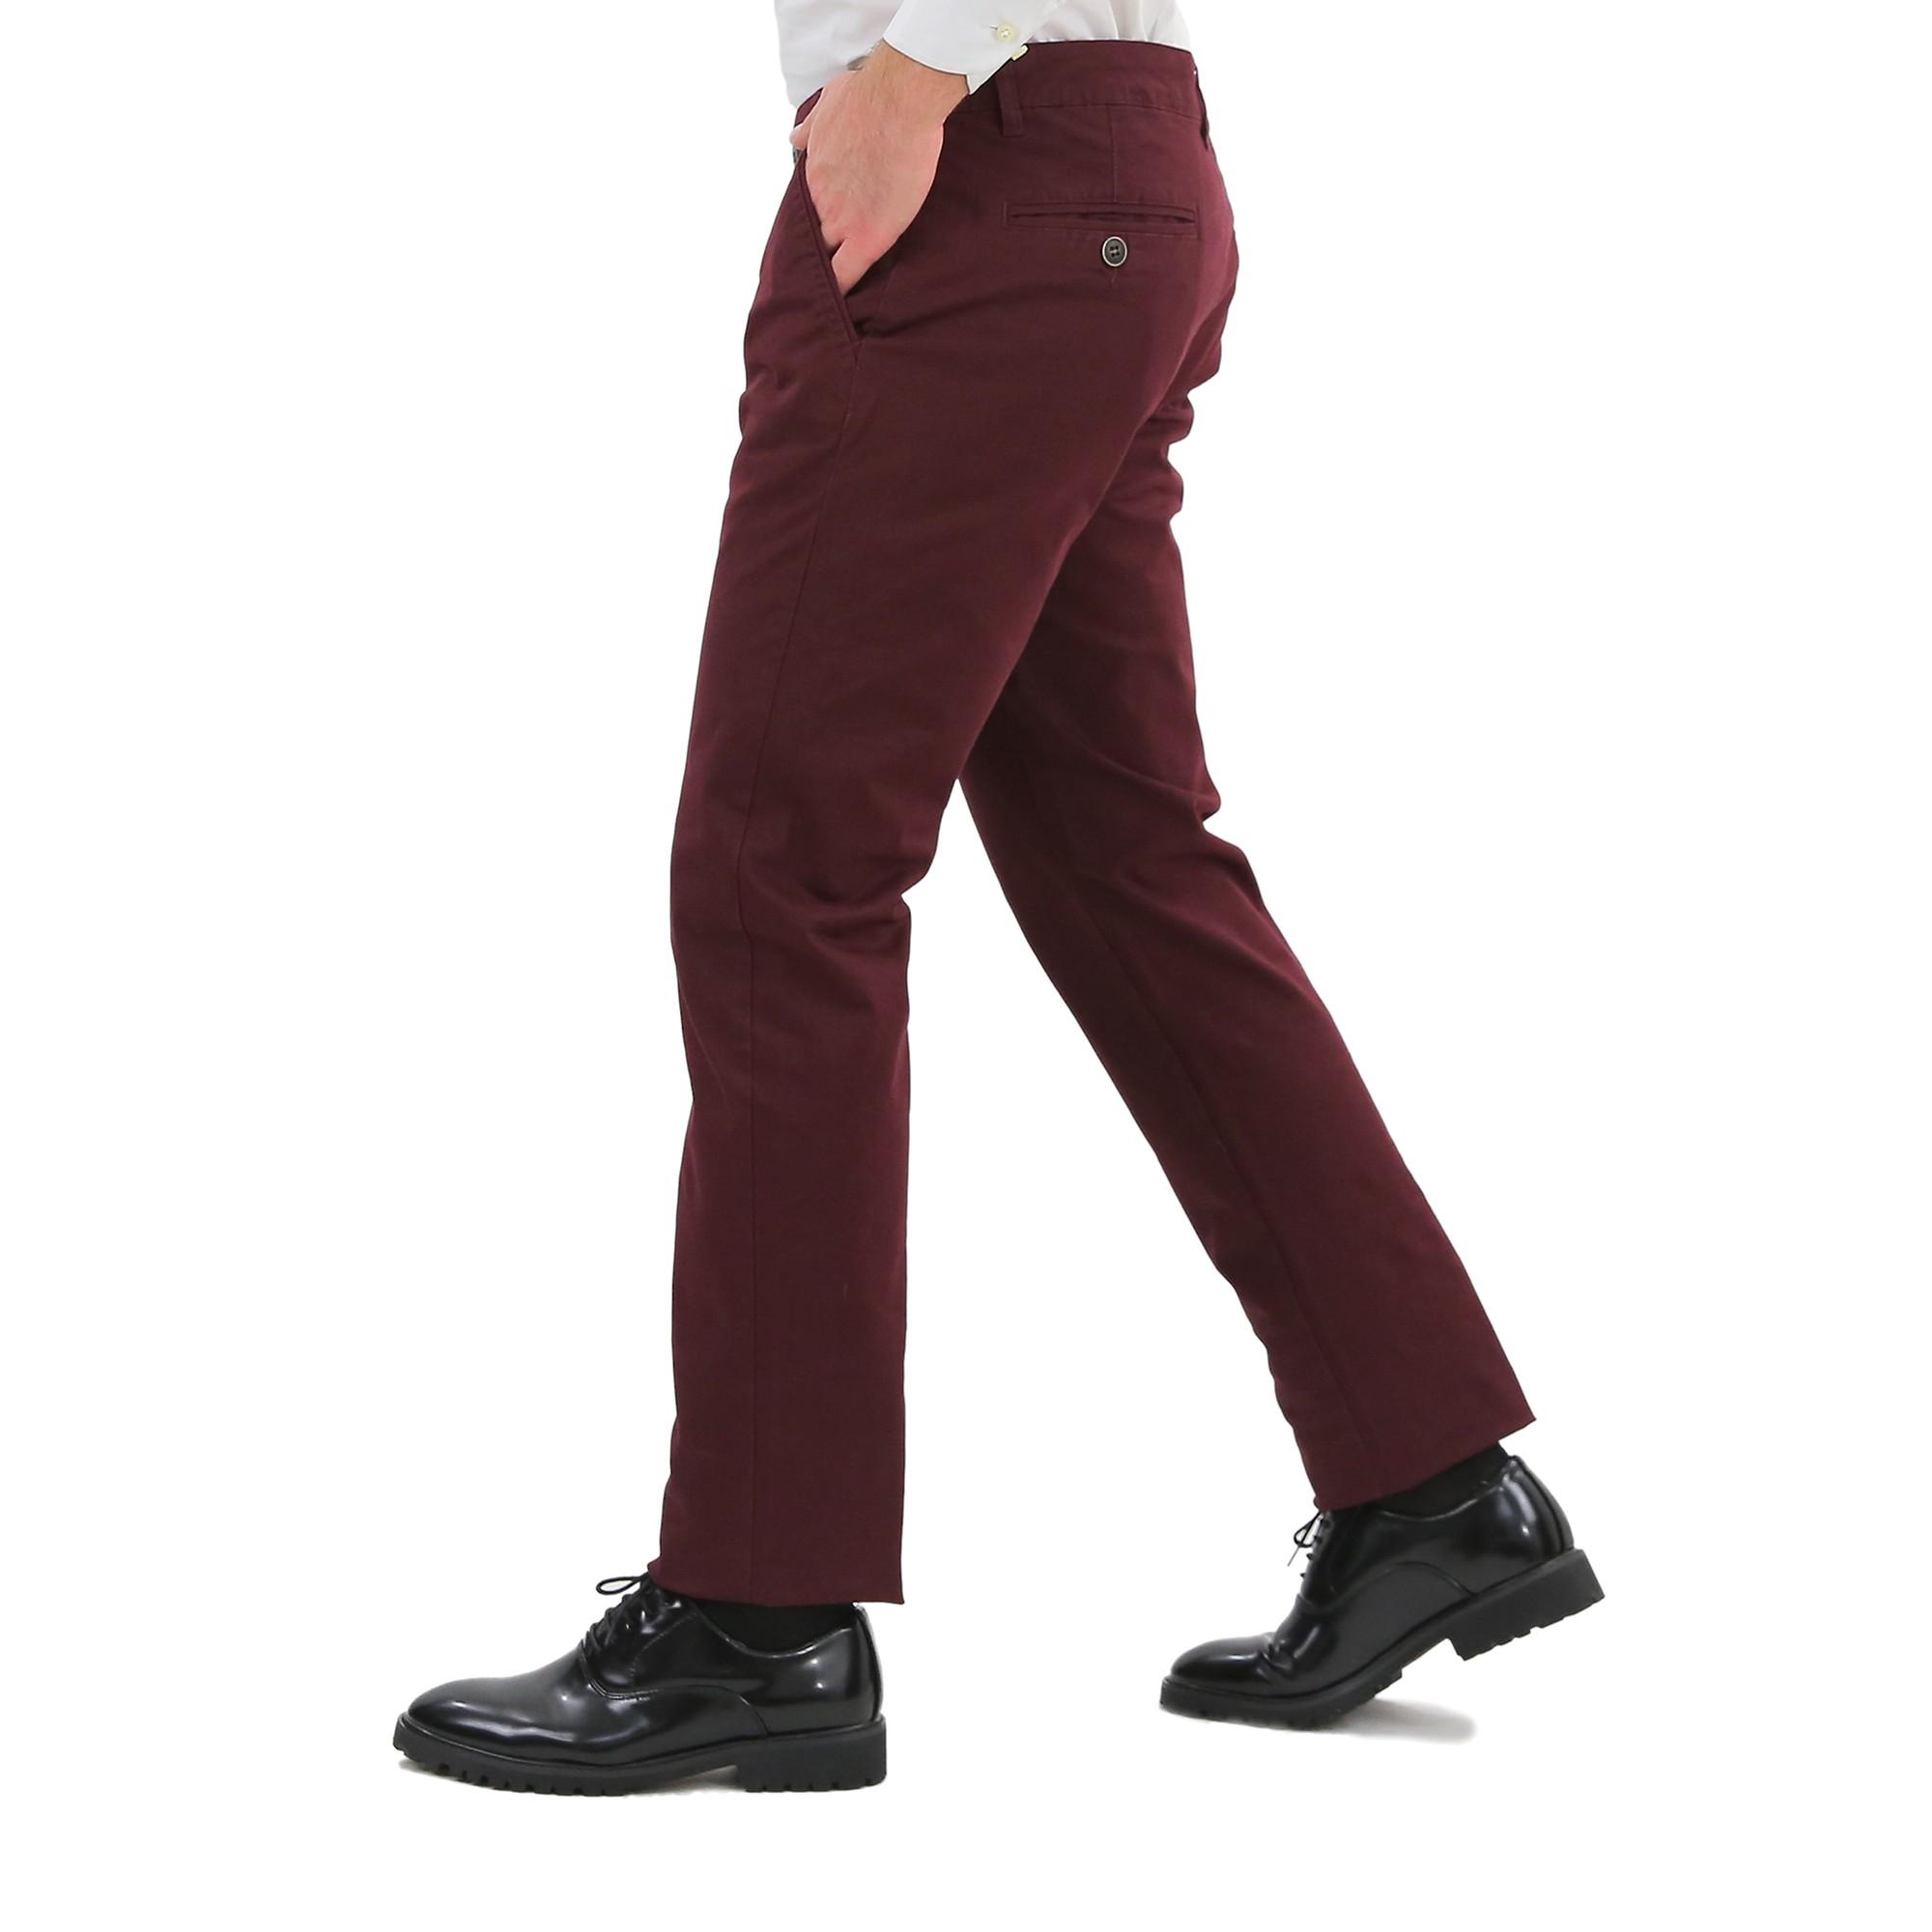 Pantaloni-Uomo-Slim-Fit-Eleganti-Invernali-Cargo-Classico-Chino-Kaki-Tasca-Ameri miniatura 12